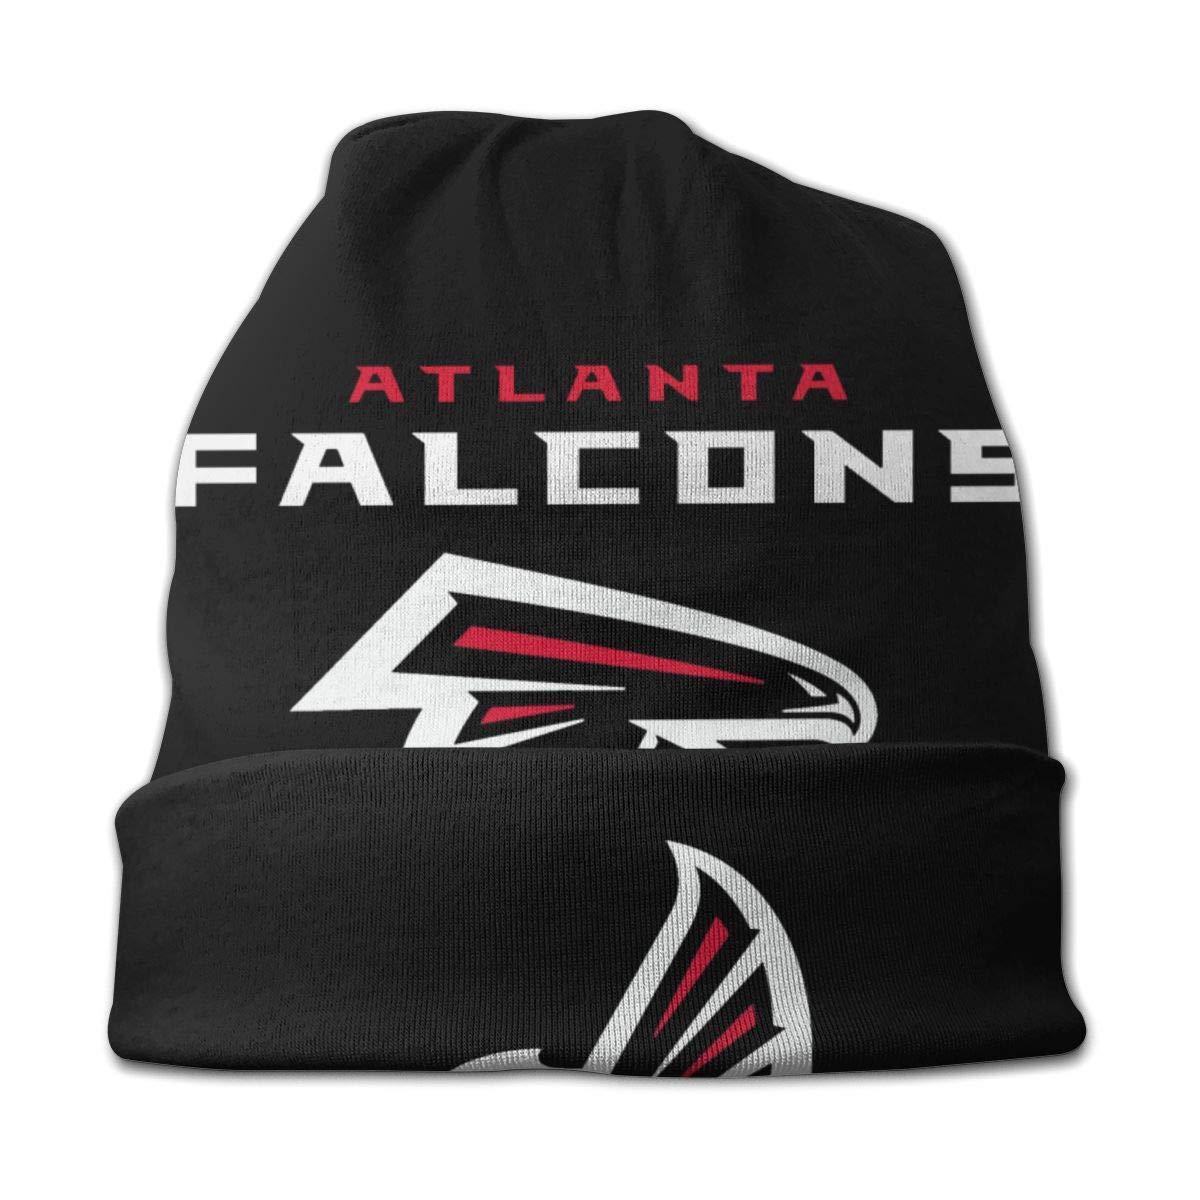 Sinobullit Kids Beanie Caps Atlanta Falcons Skull Cap Knitting Hat Warm Winter Knit Hats for Boys Girls Black